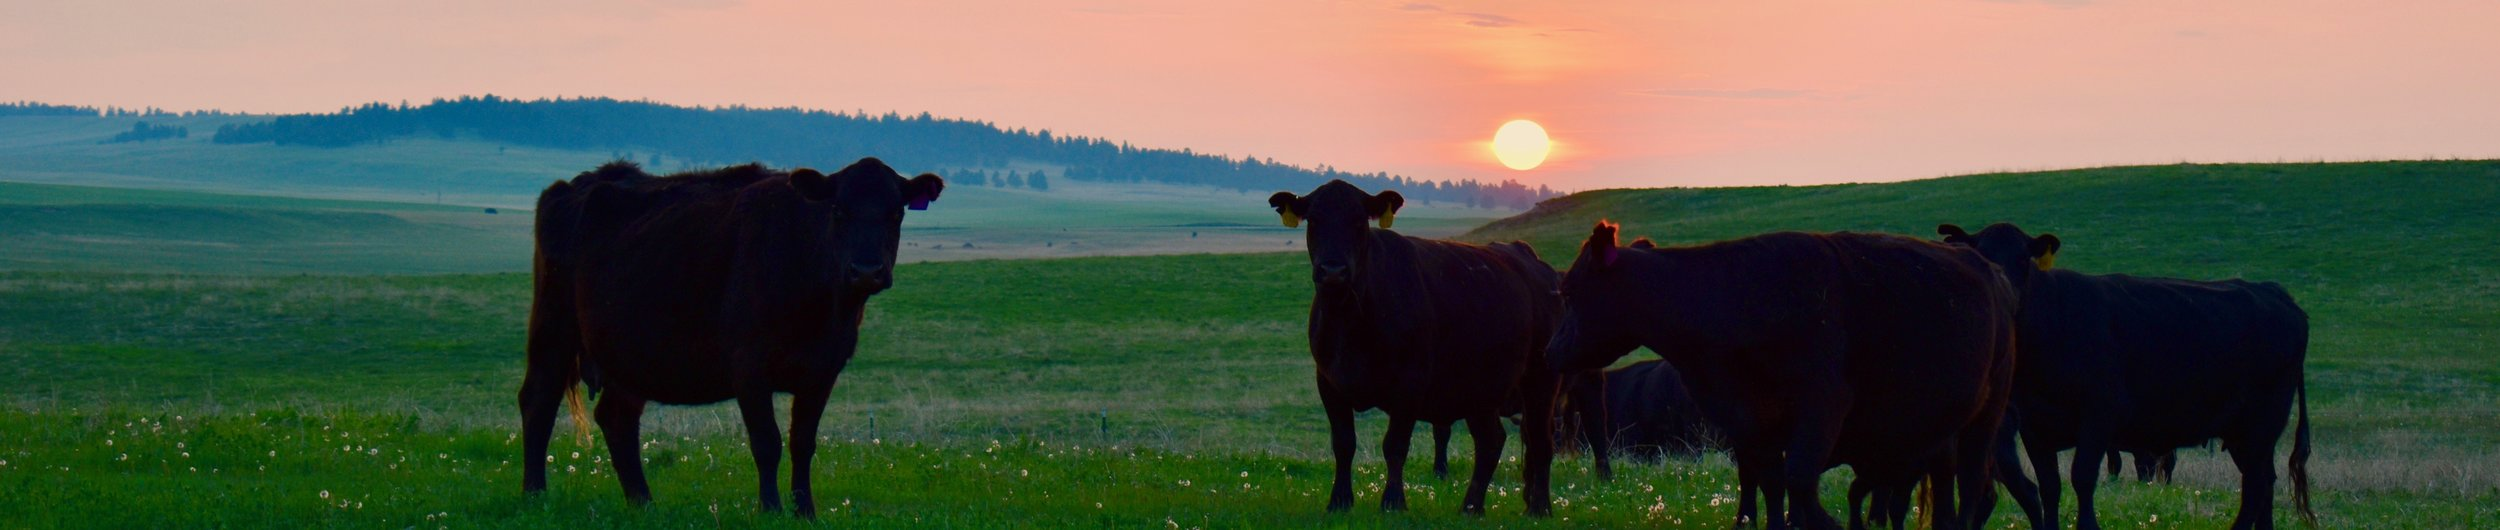 MM Matovich Ranch cattle